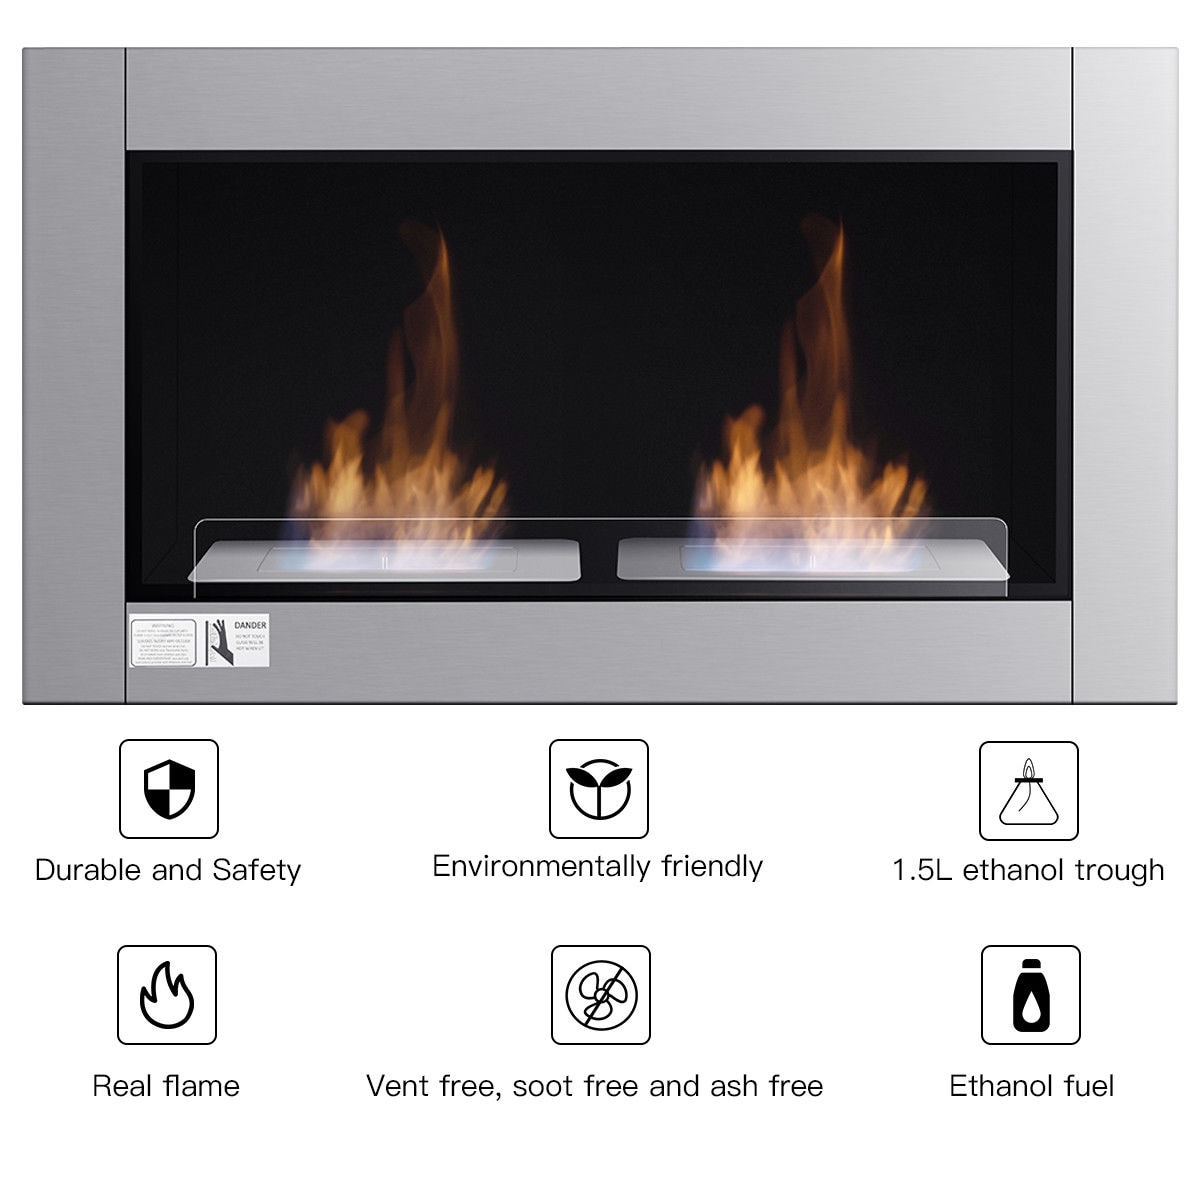 Fabulous Gymax 38 Inch Wall Mounted Bio Ethanol Fireplace Ventless Dual Burner Fireplace Download Free Architecture Designs Scobabritishbridgeorg